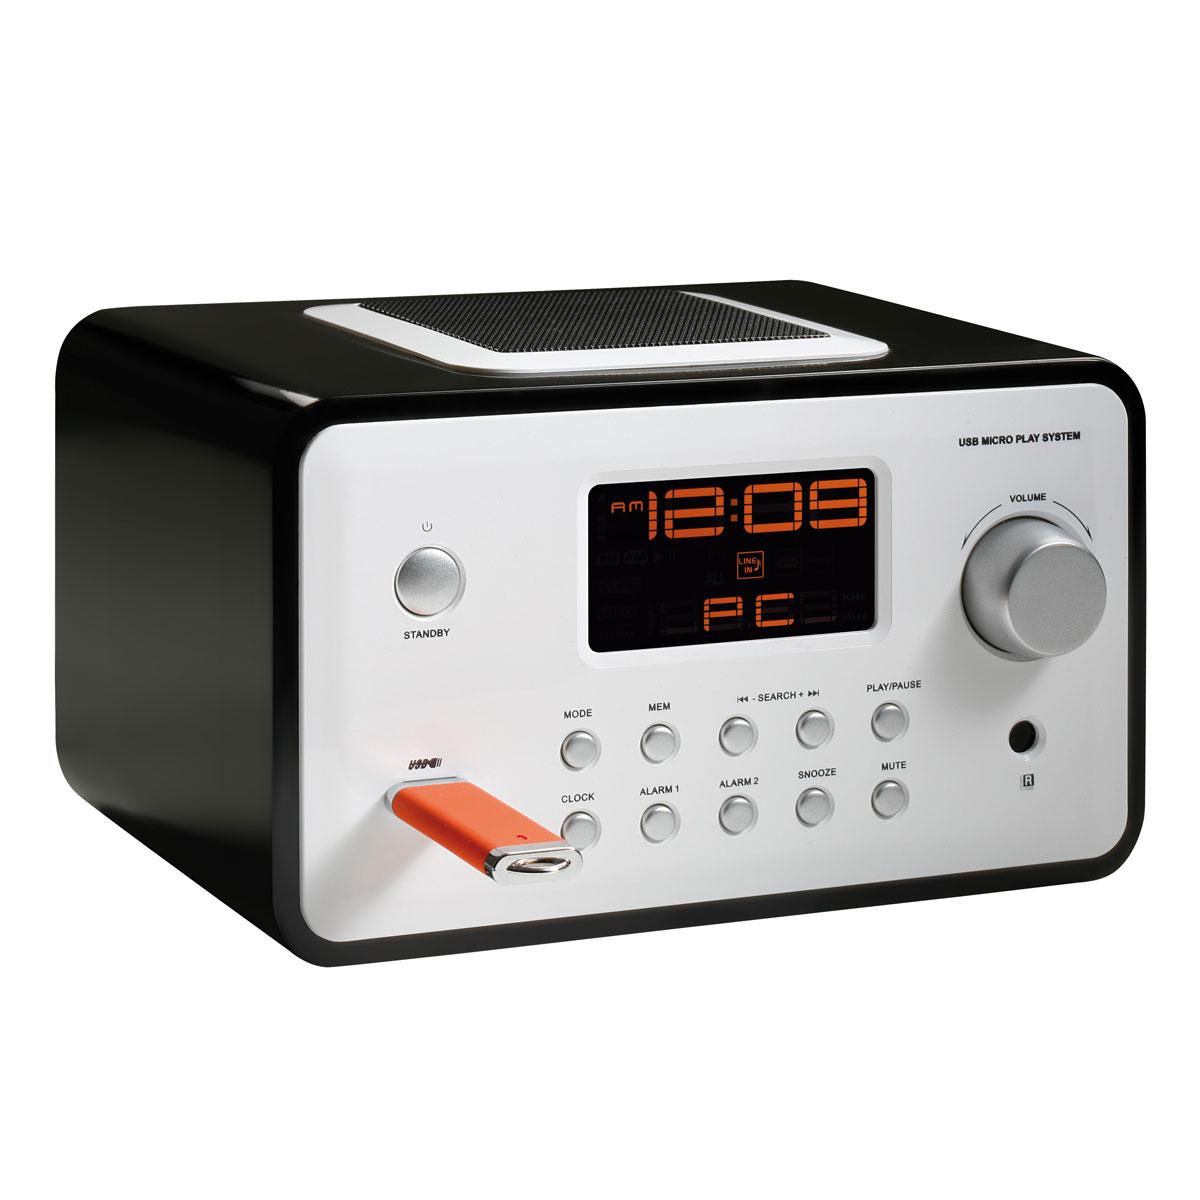 clipsonic ra1040n noir radio radio r veil clipsonic sur. Black Bedroom Furniture Sets. Home Design Ideas